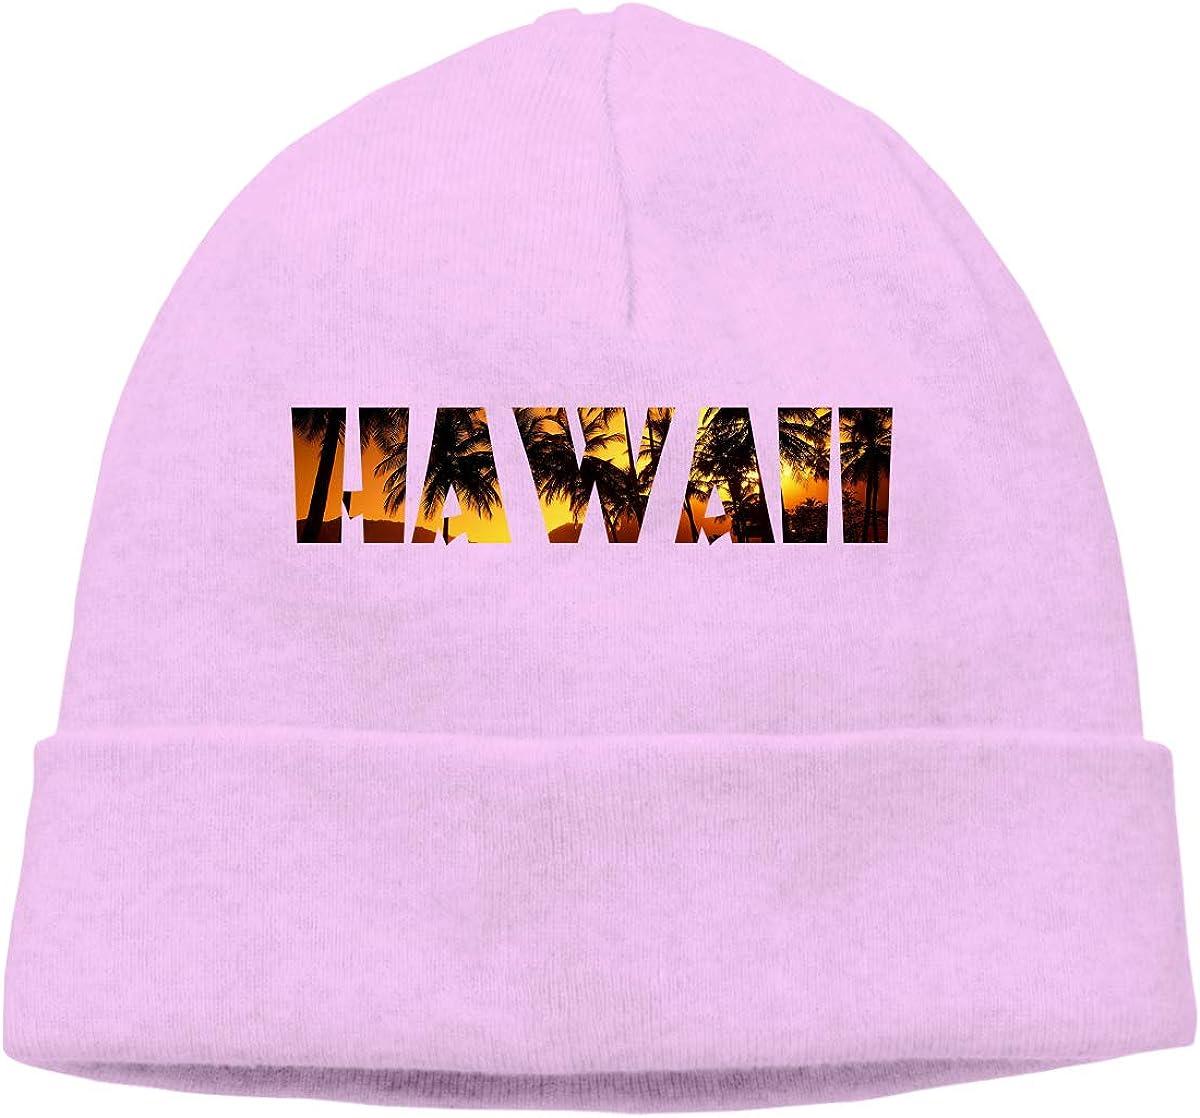 GDSG5/&4 Hawaii Text Men Women Stretchy /& Soft Surf Beanie Skull Cap